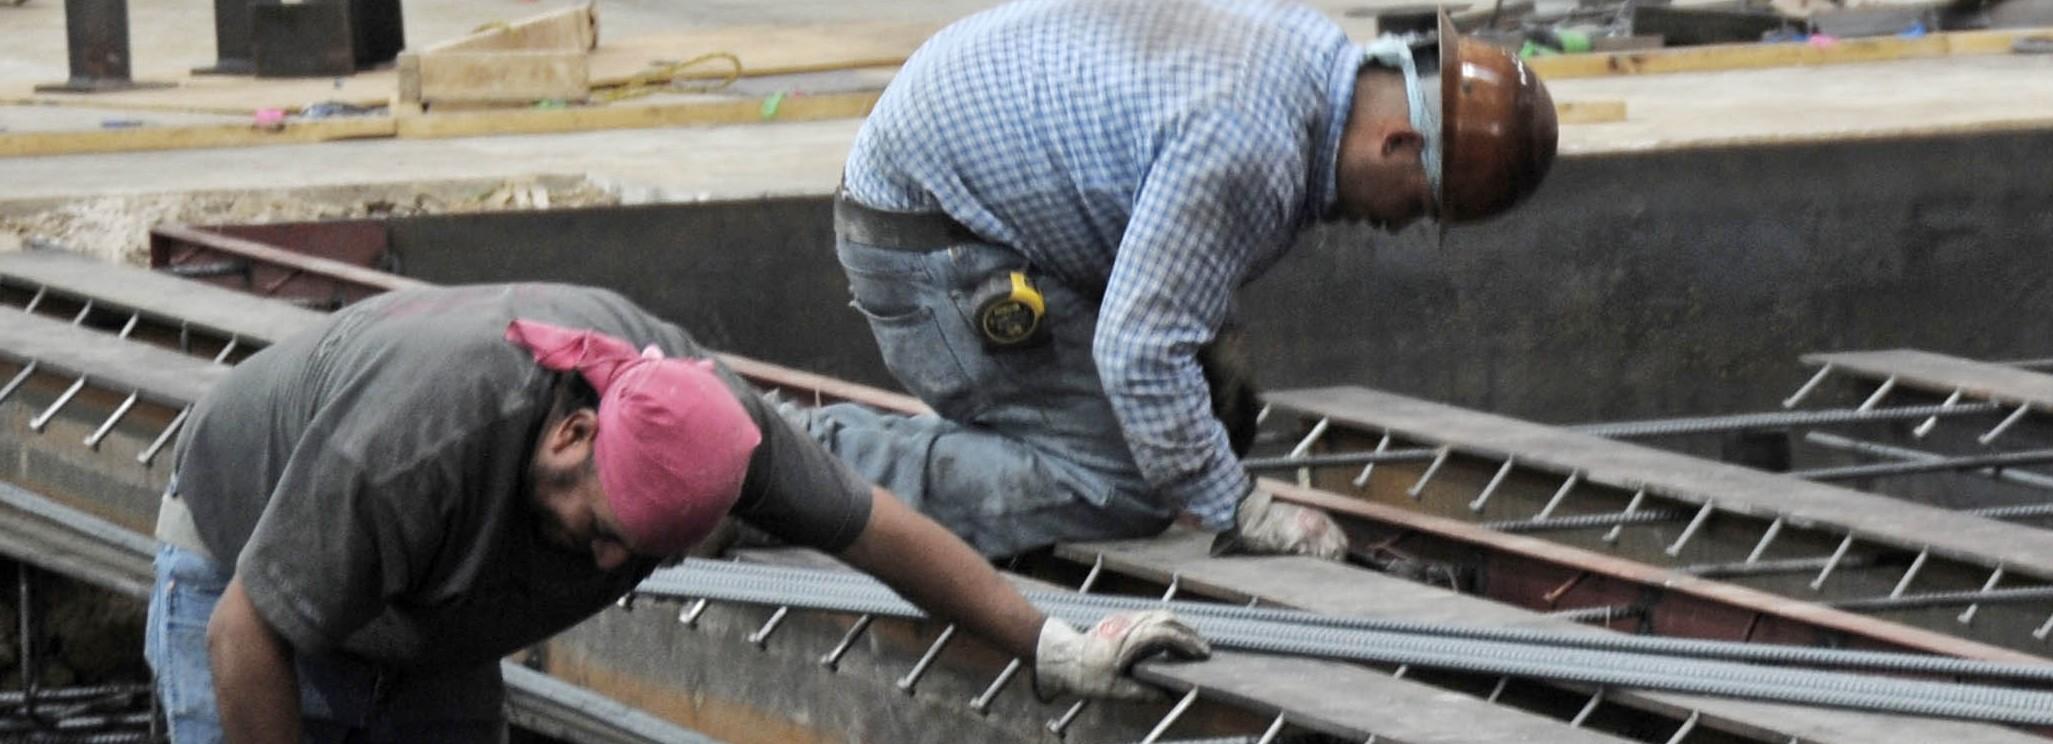 Progressive Industries Industrial Construction Interior Foundation